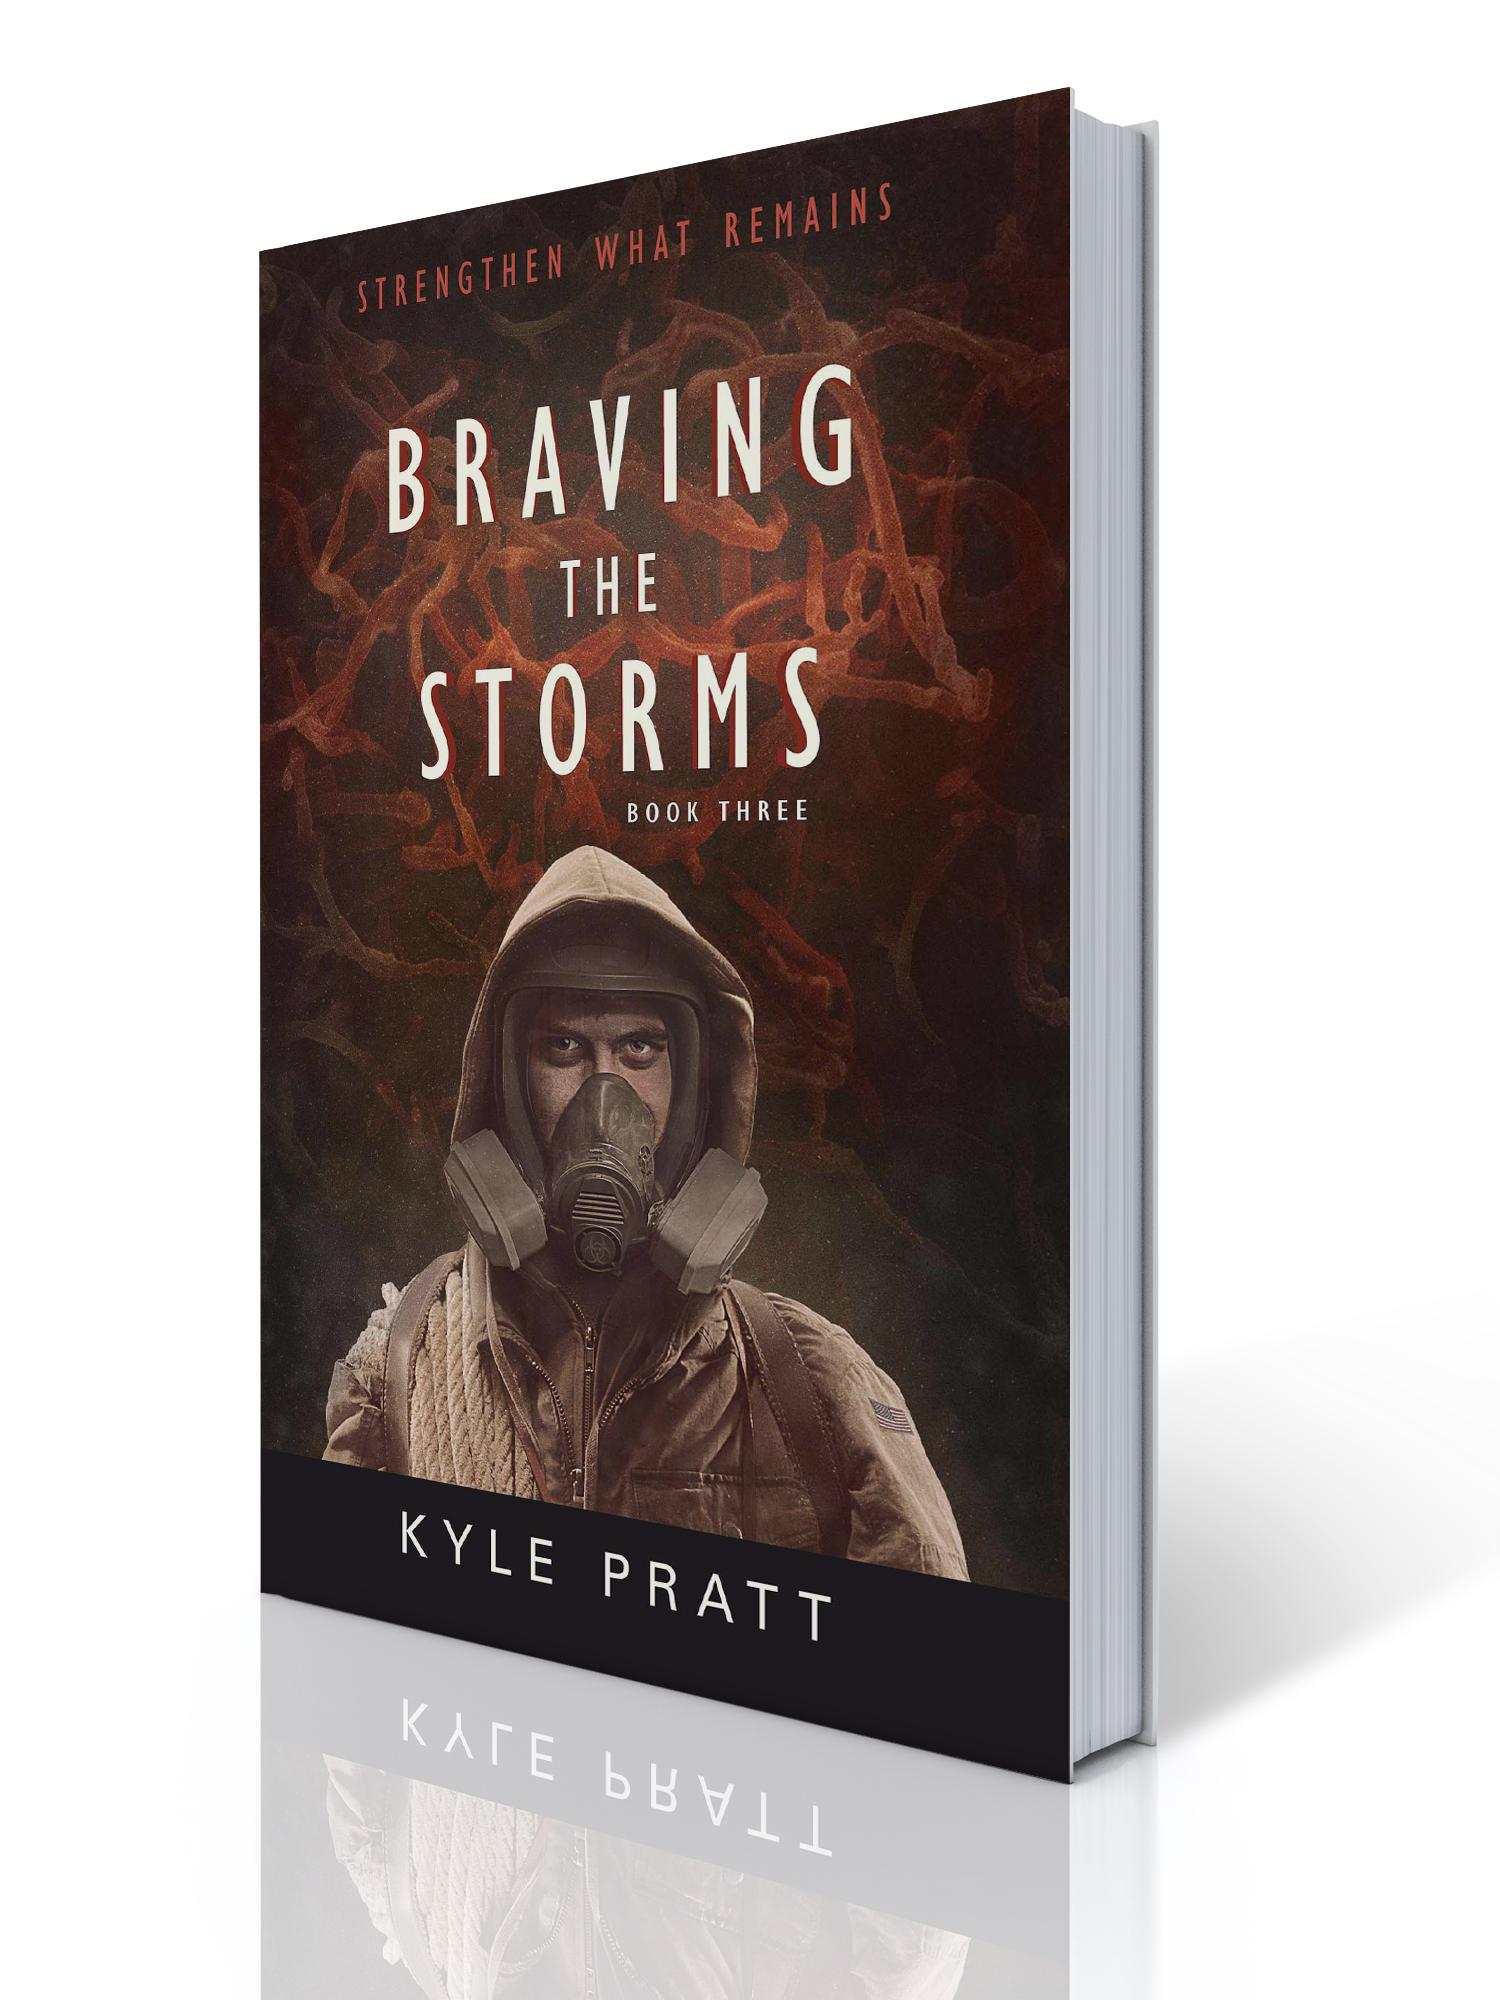 Braving the Storms by Kyle Pratt